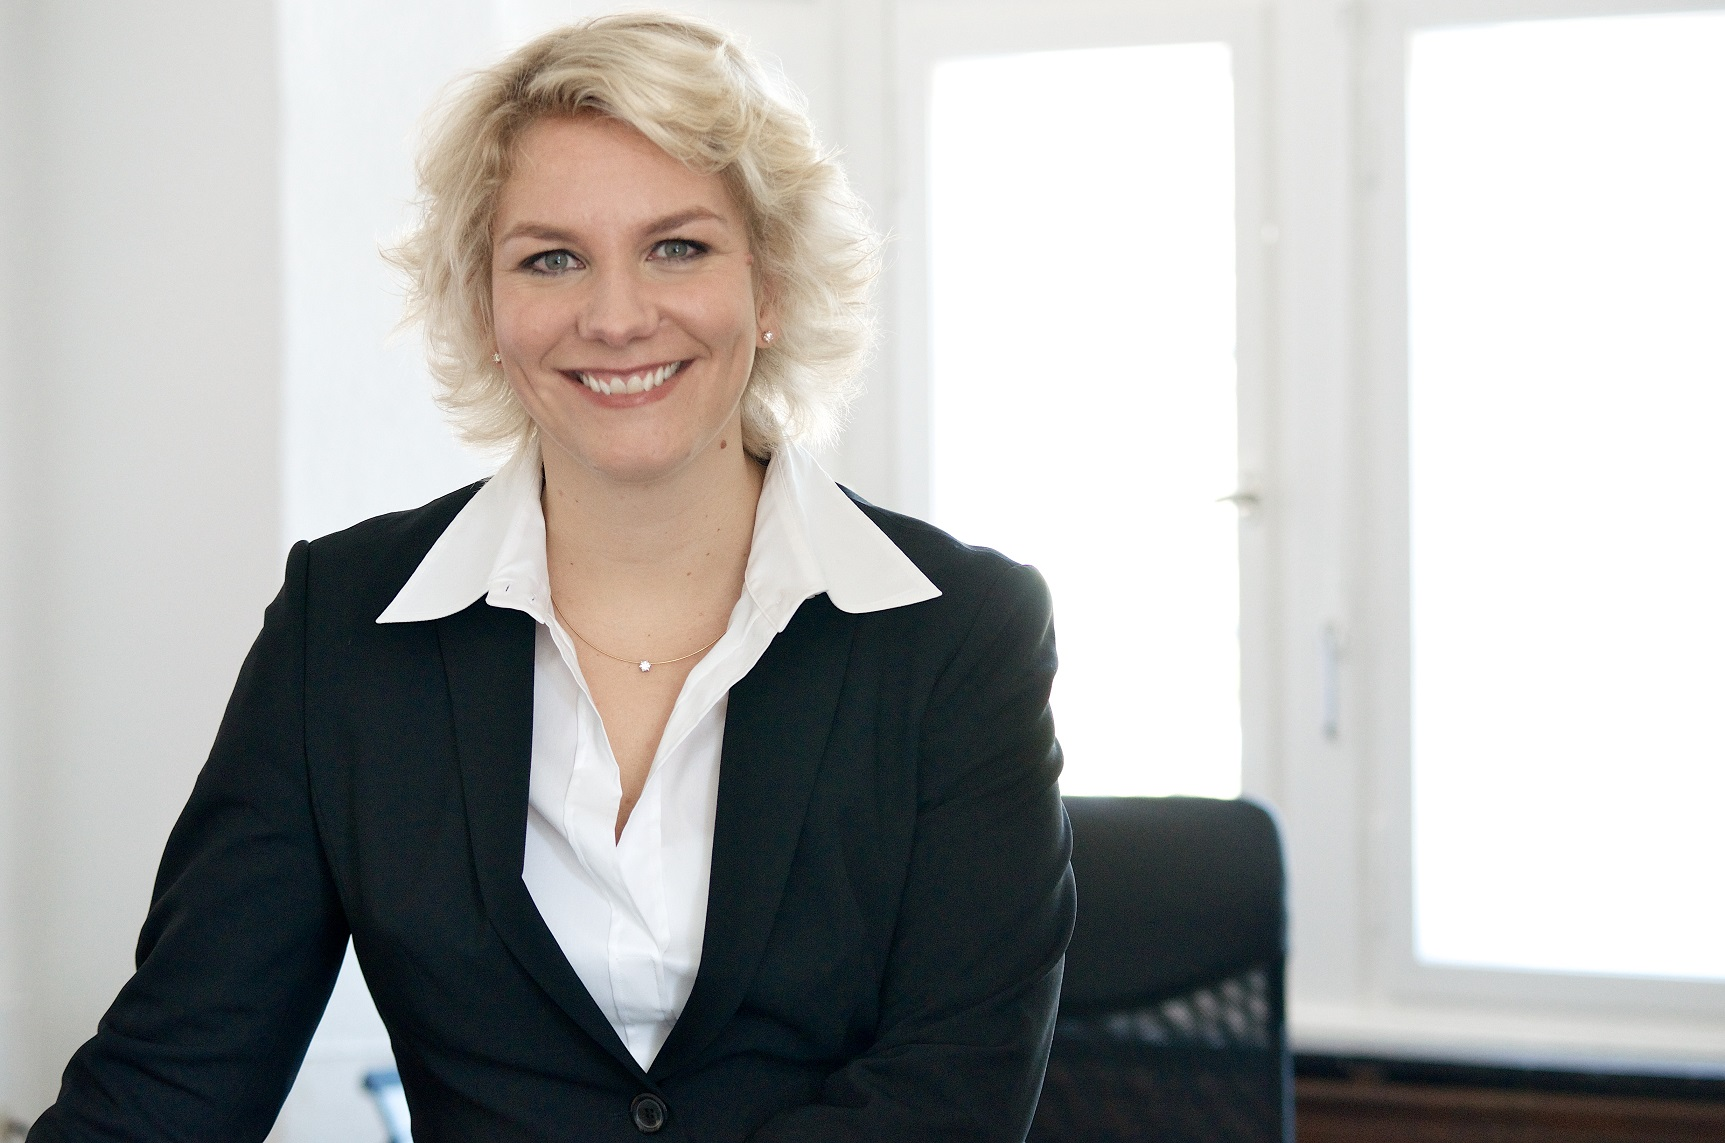 Nicole Mutschke Rechtsanwaltsgesellschaft mbH anwalt experte